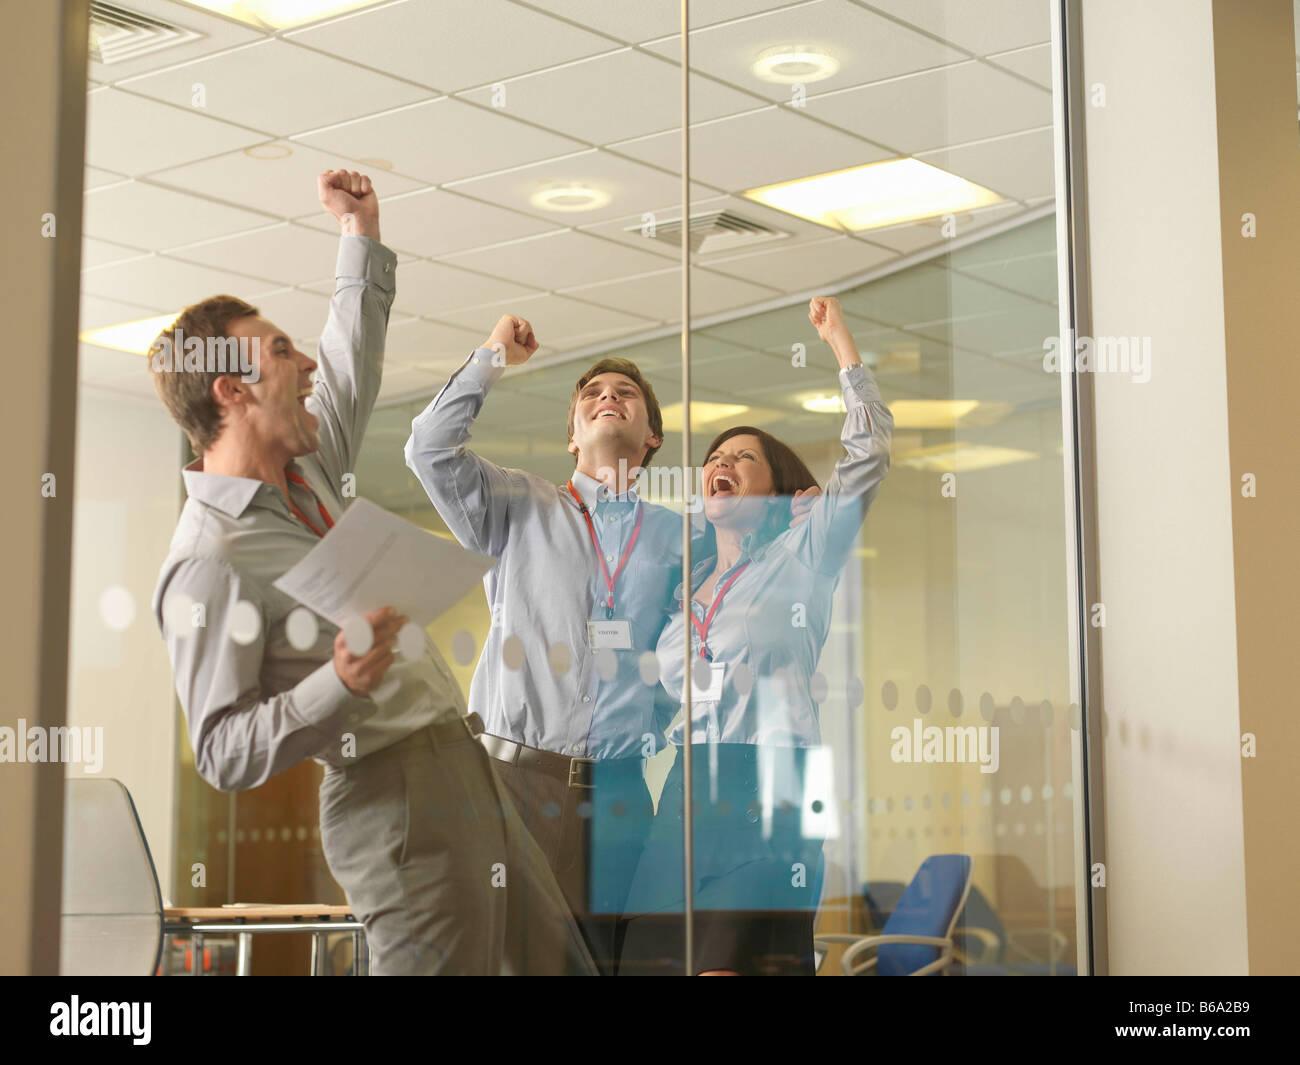 Office staff celebrating - Stock Image